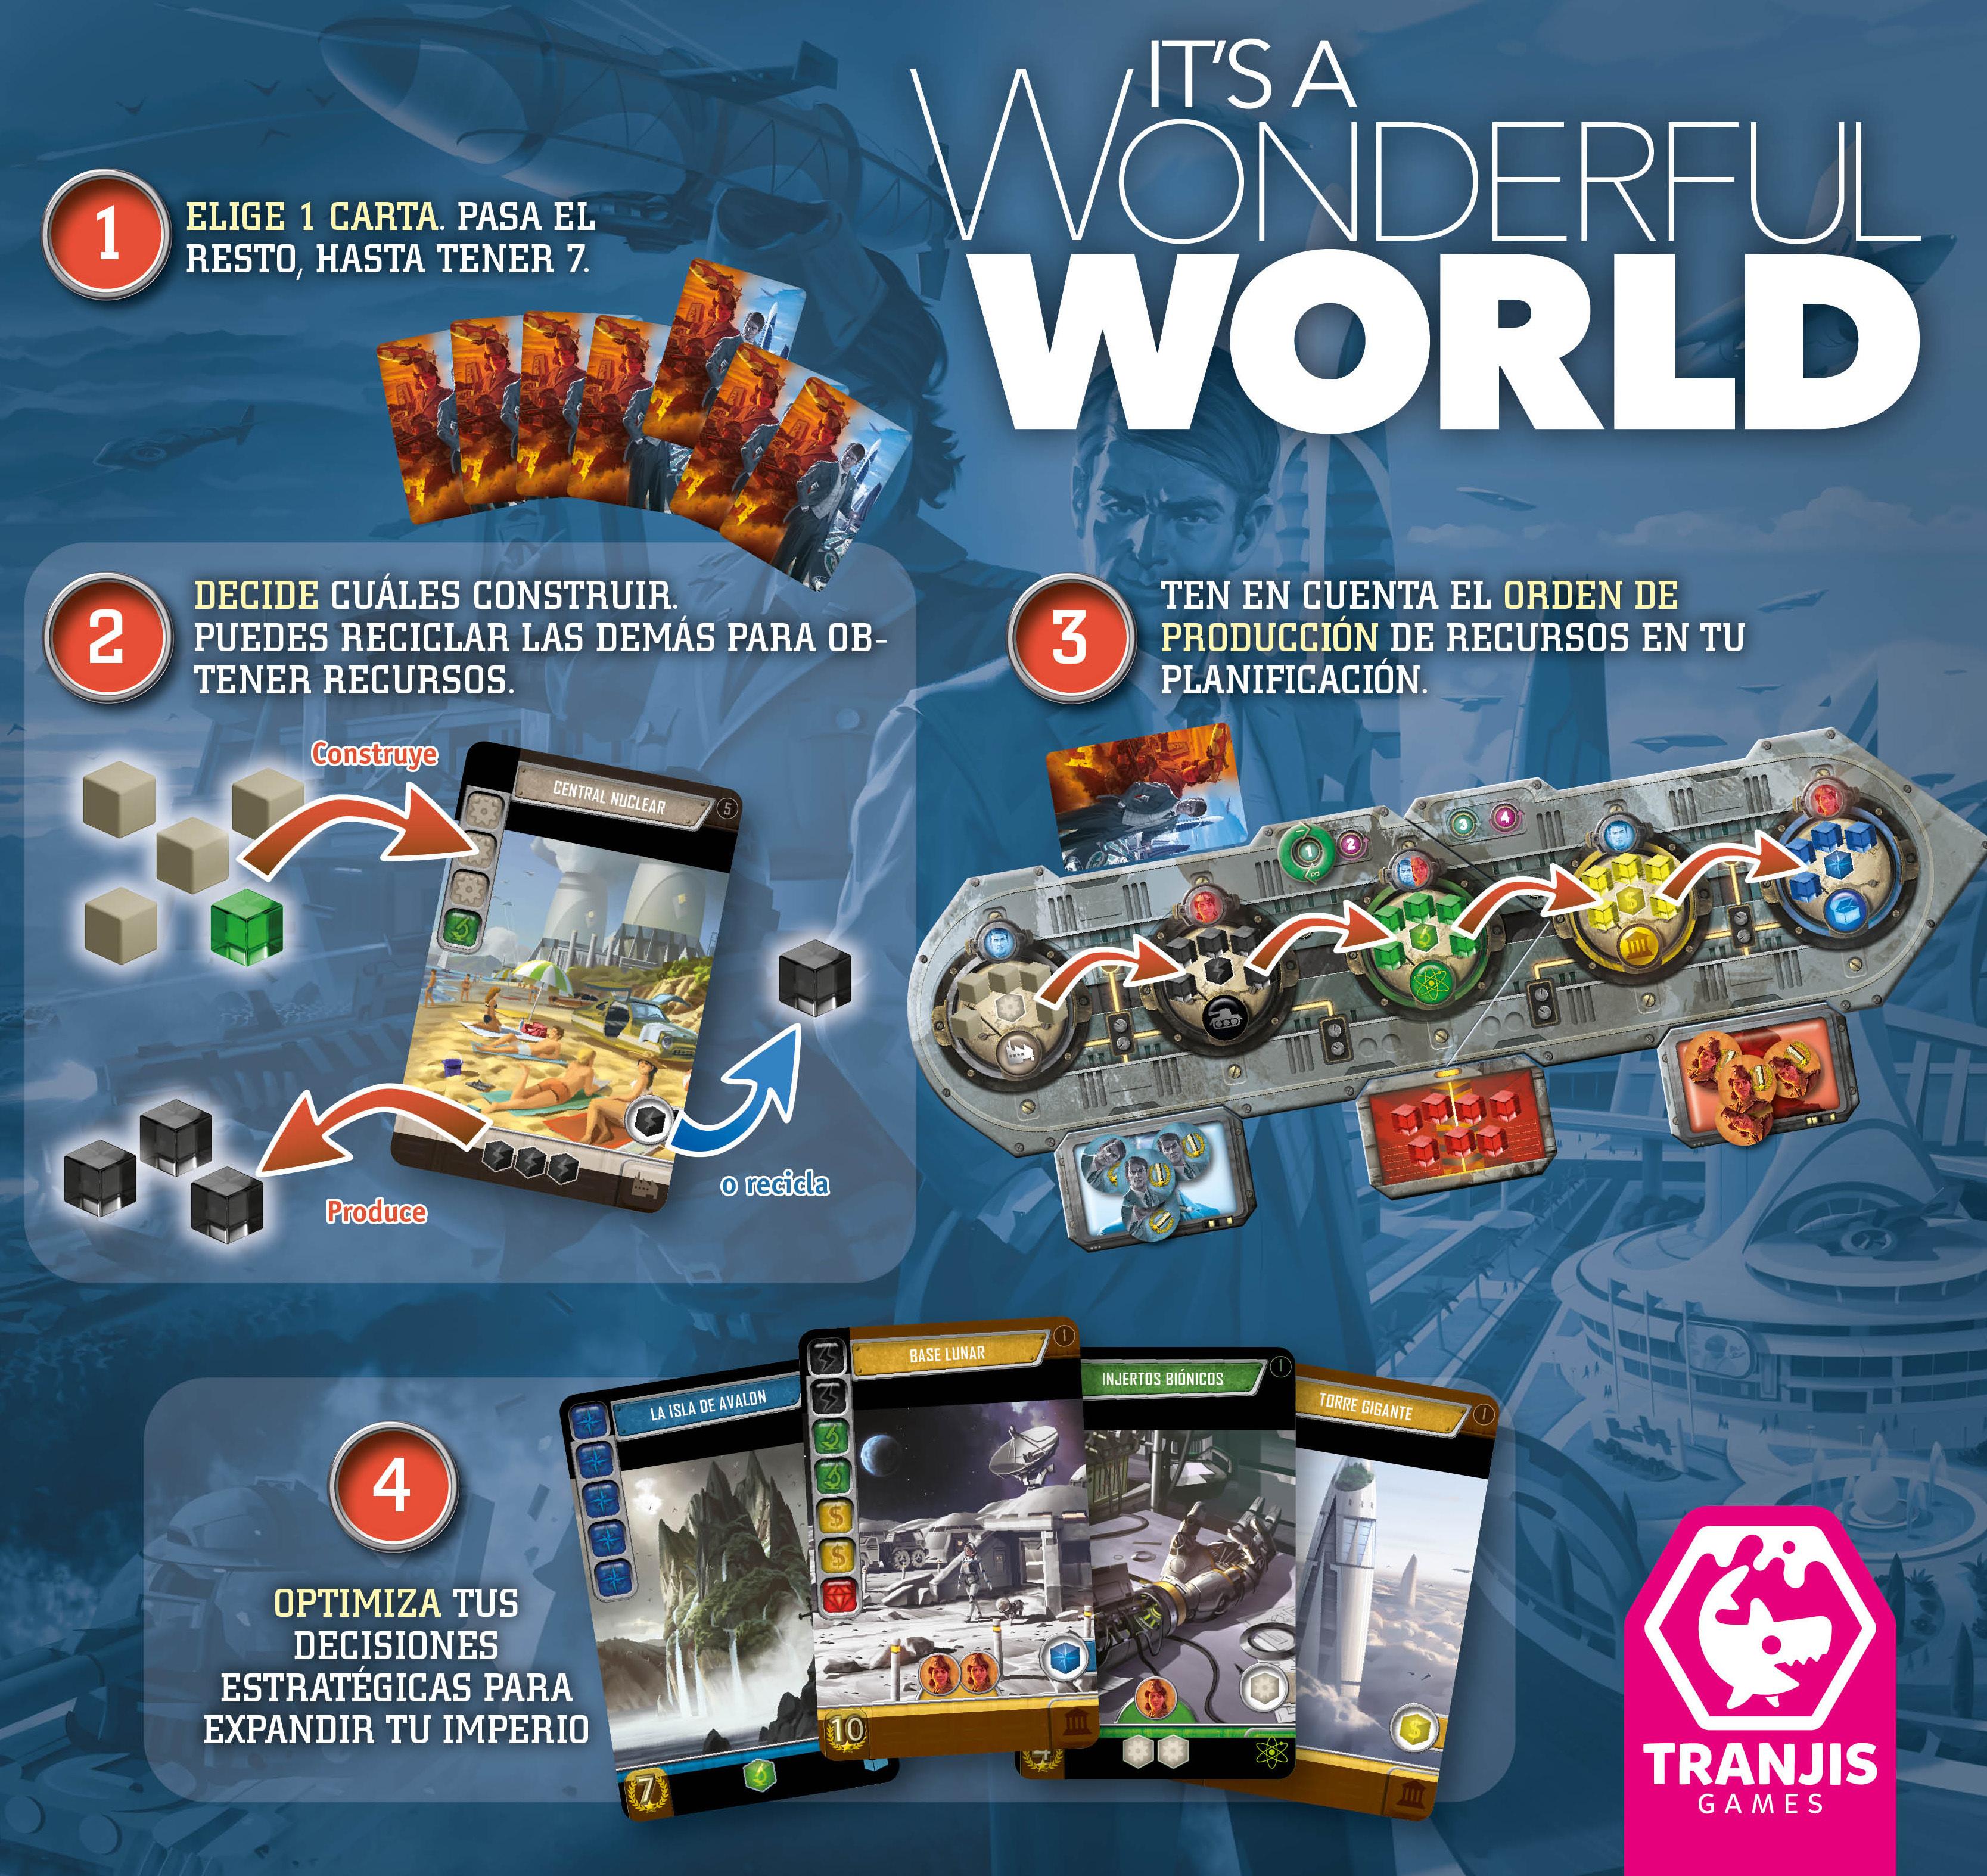 Wonderful World - Tranjis